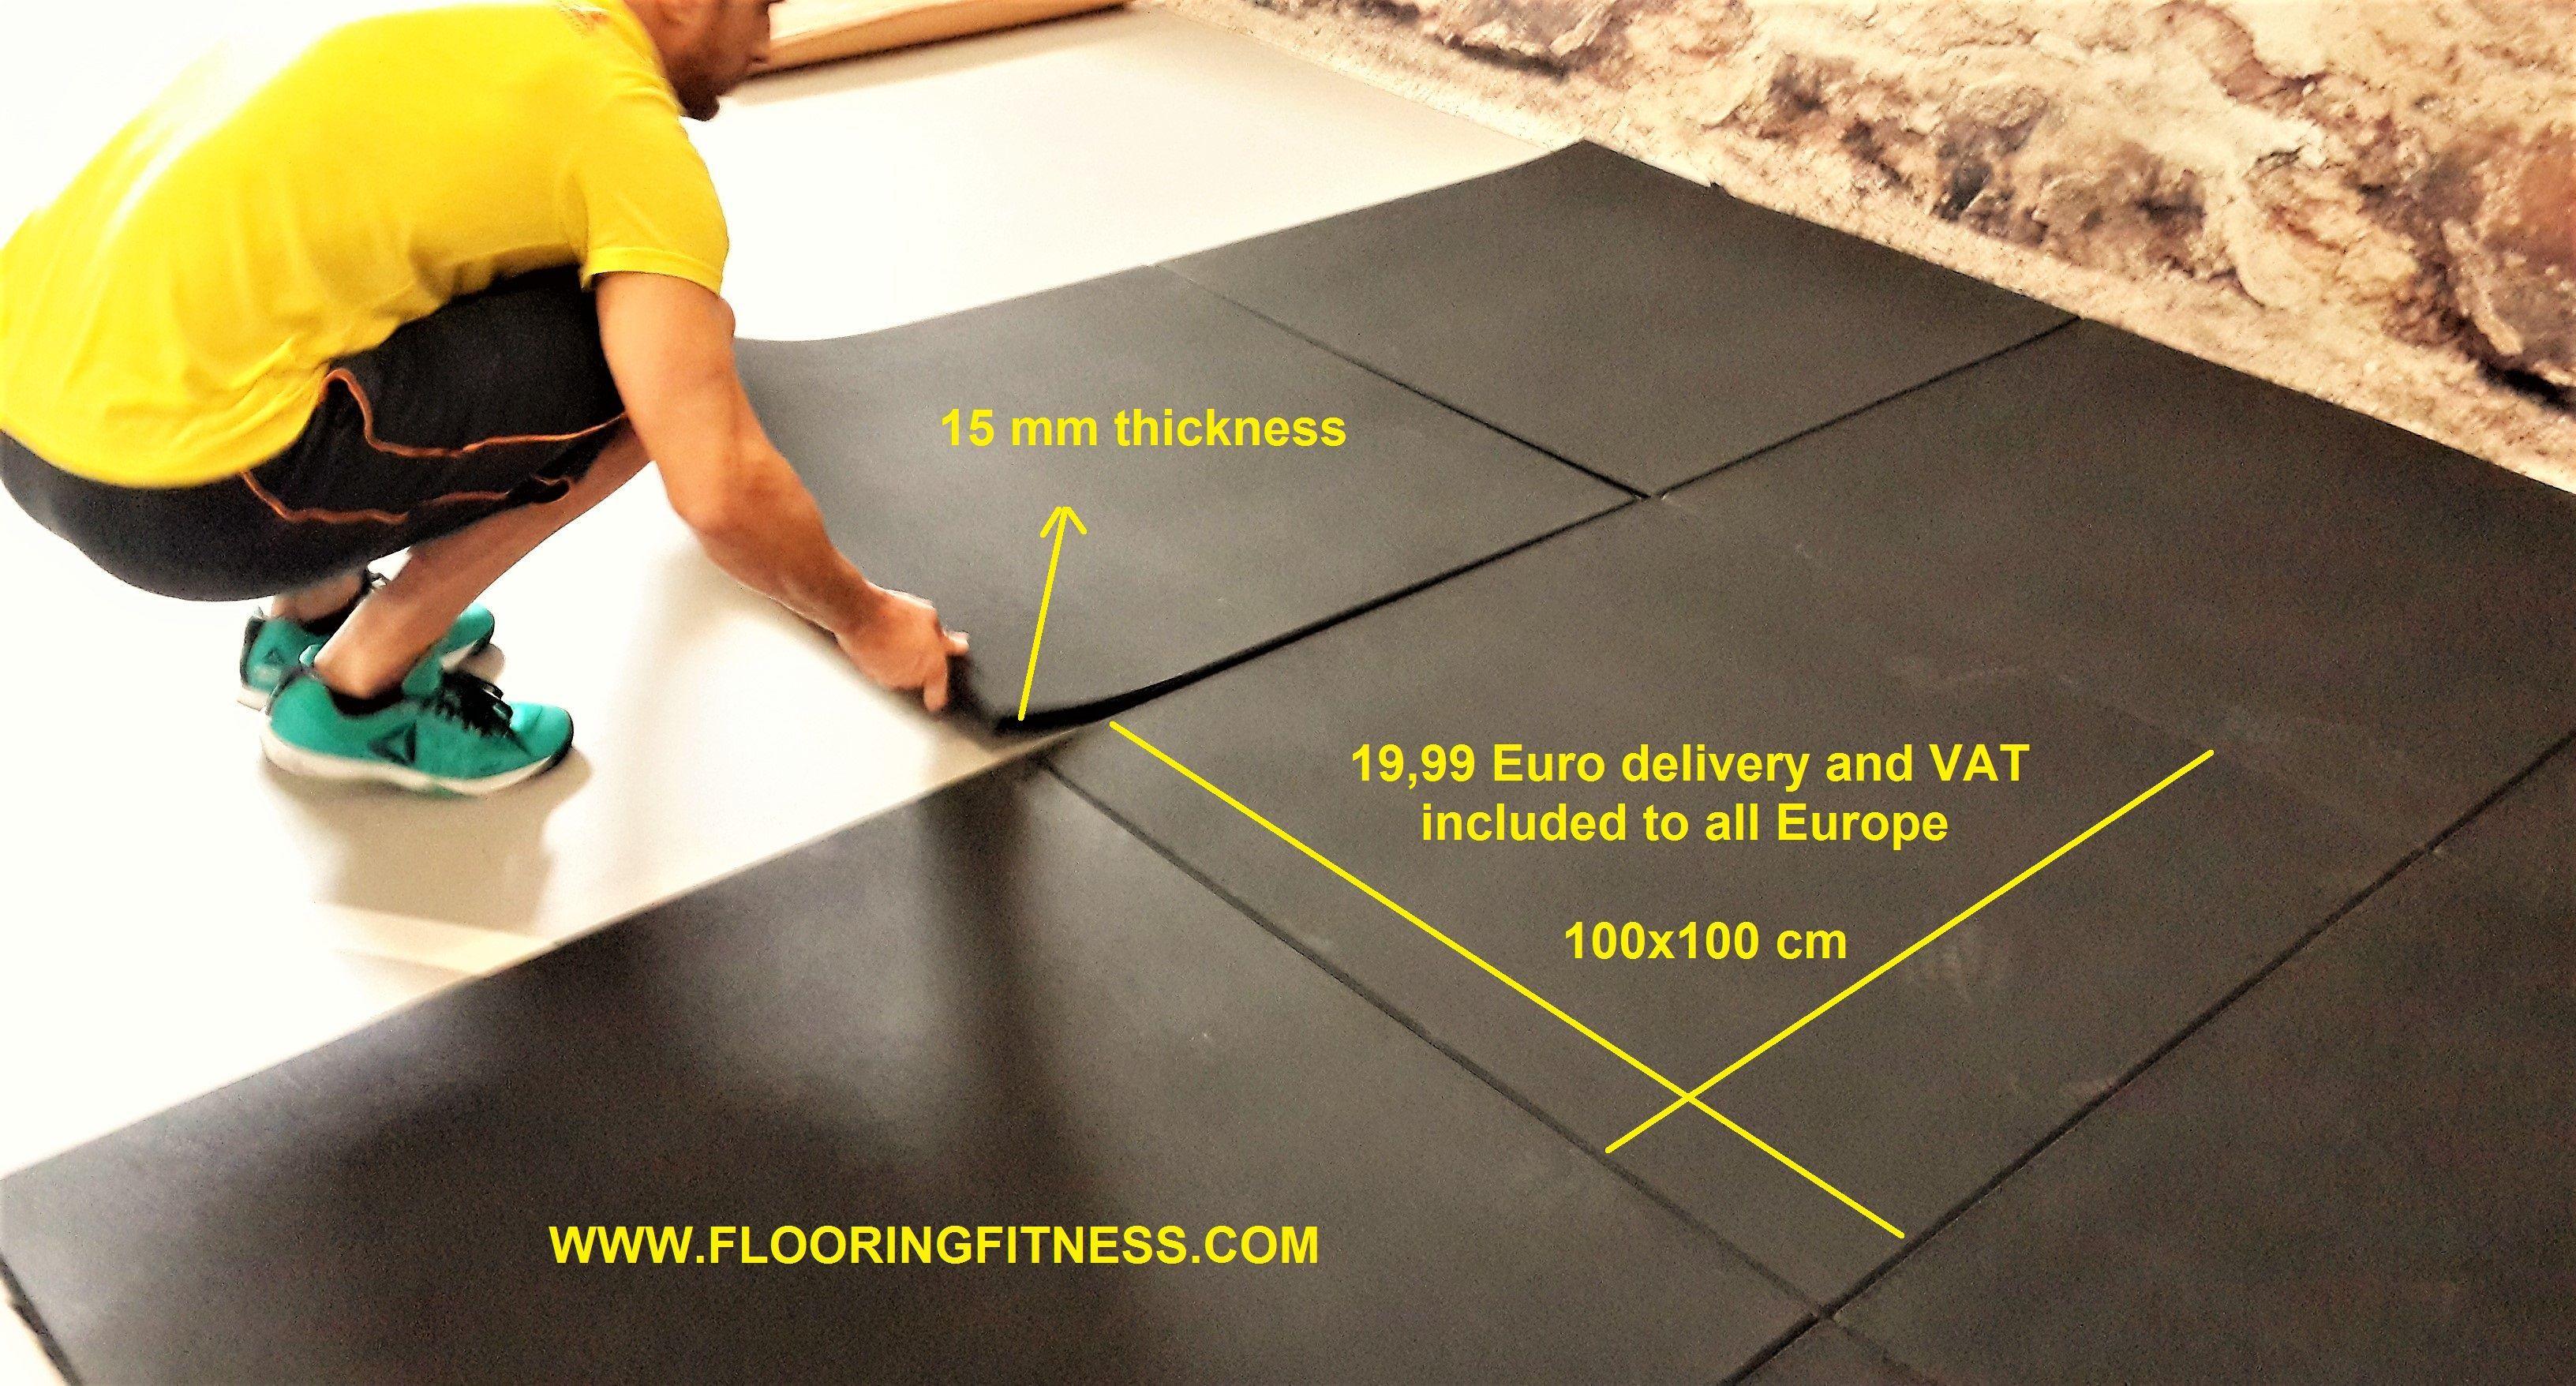 Gym flooring tiles 1999 euro flooringfitness gym flooring gym flooring tiles 1999 euro flooringfitness dailygadgetfo Image collections